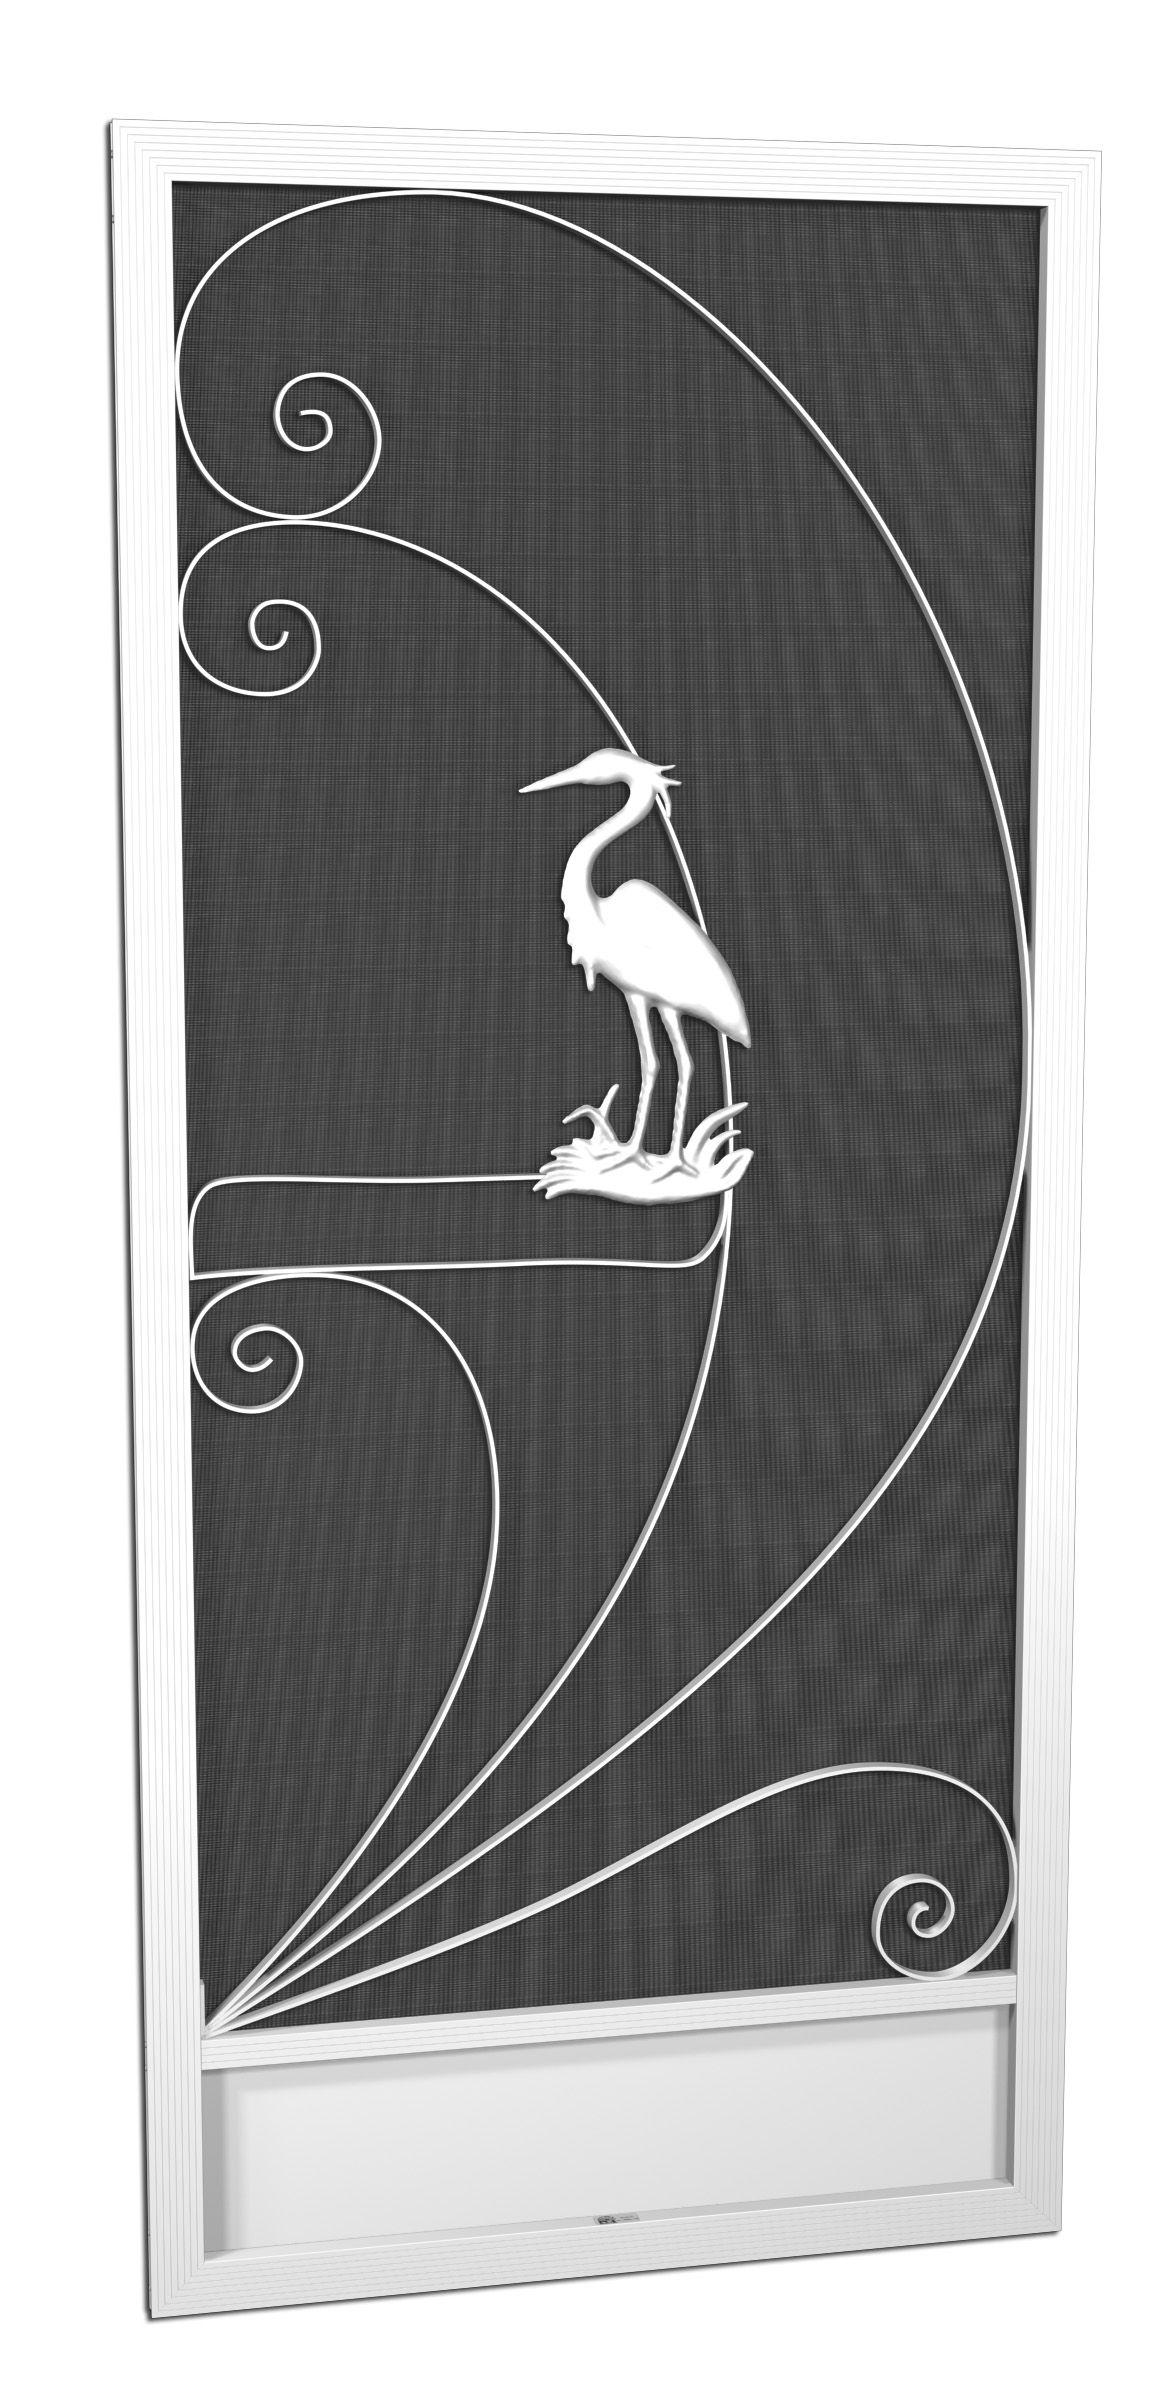 Handcrafted Custom Aluminum Screen Door Company In The By Pca